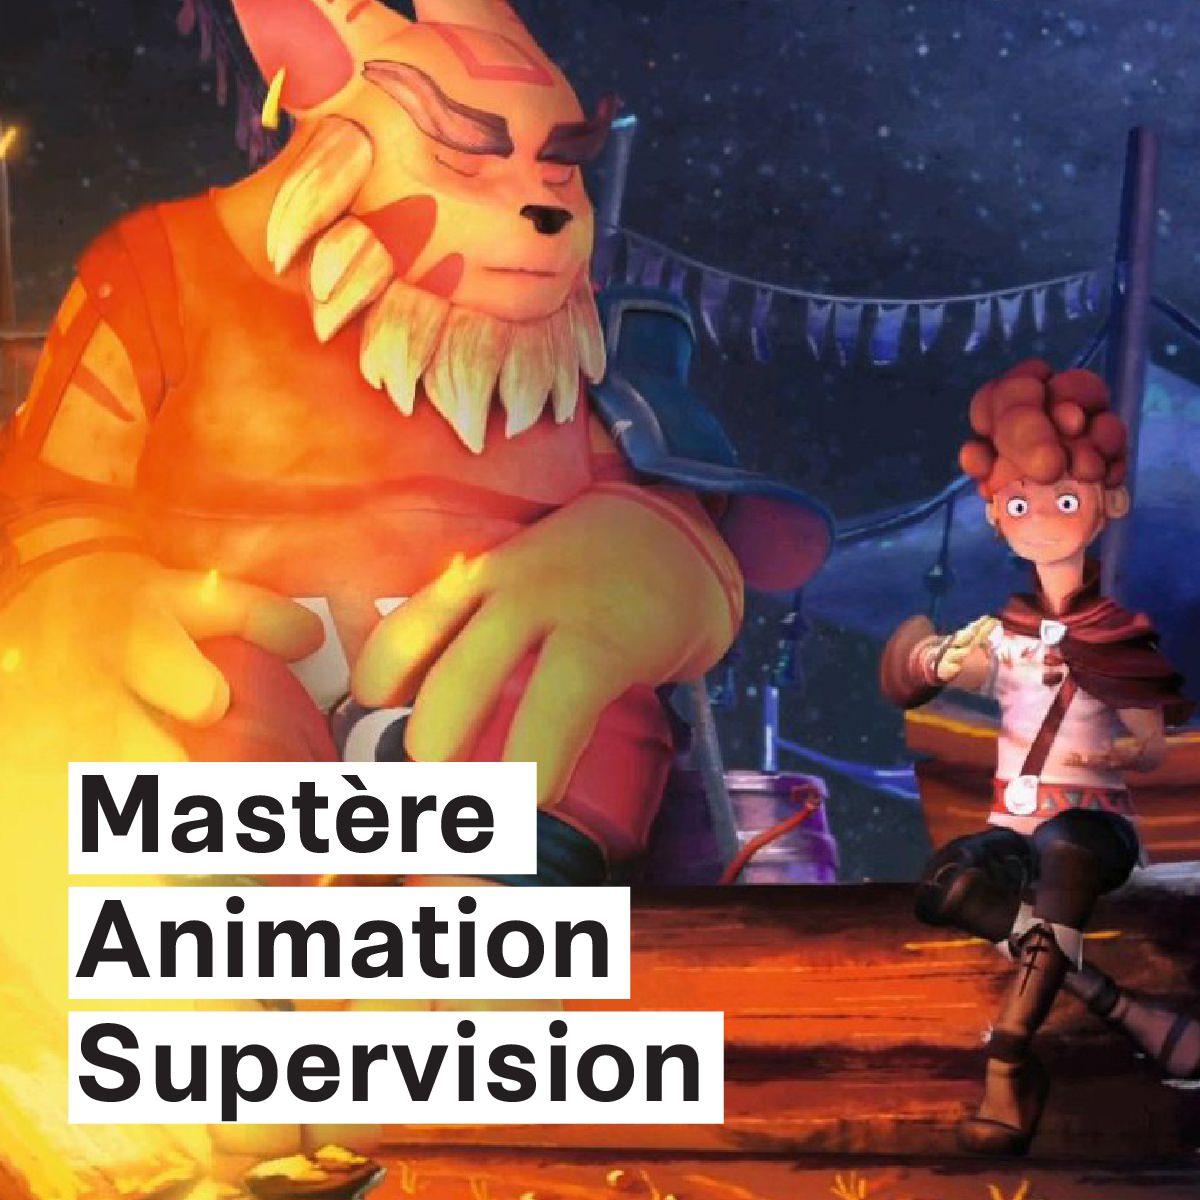 Bellecour Ecole - Mastere Animation